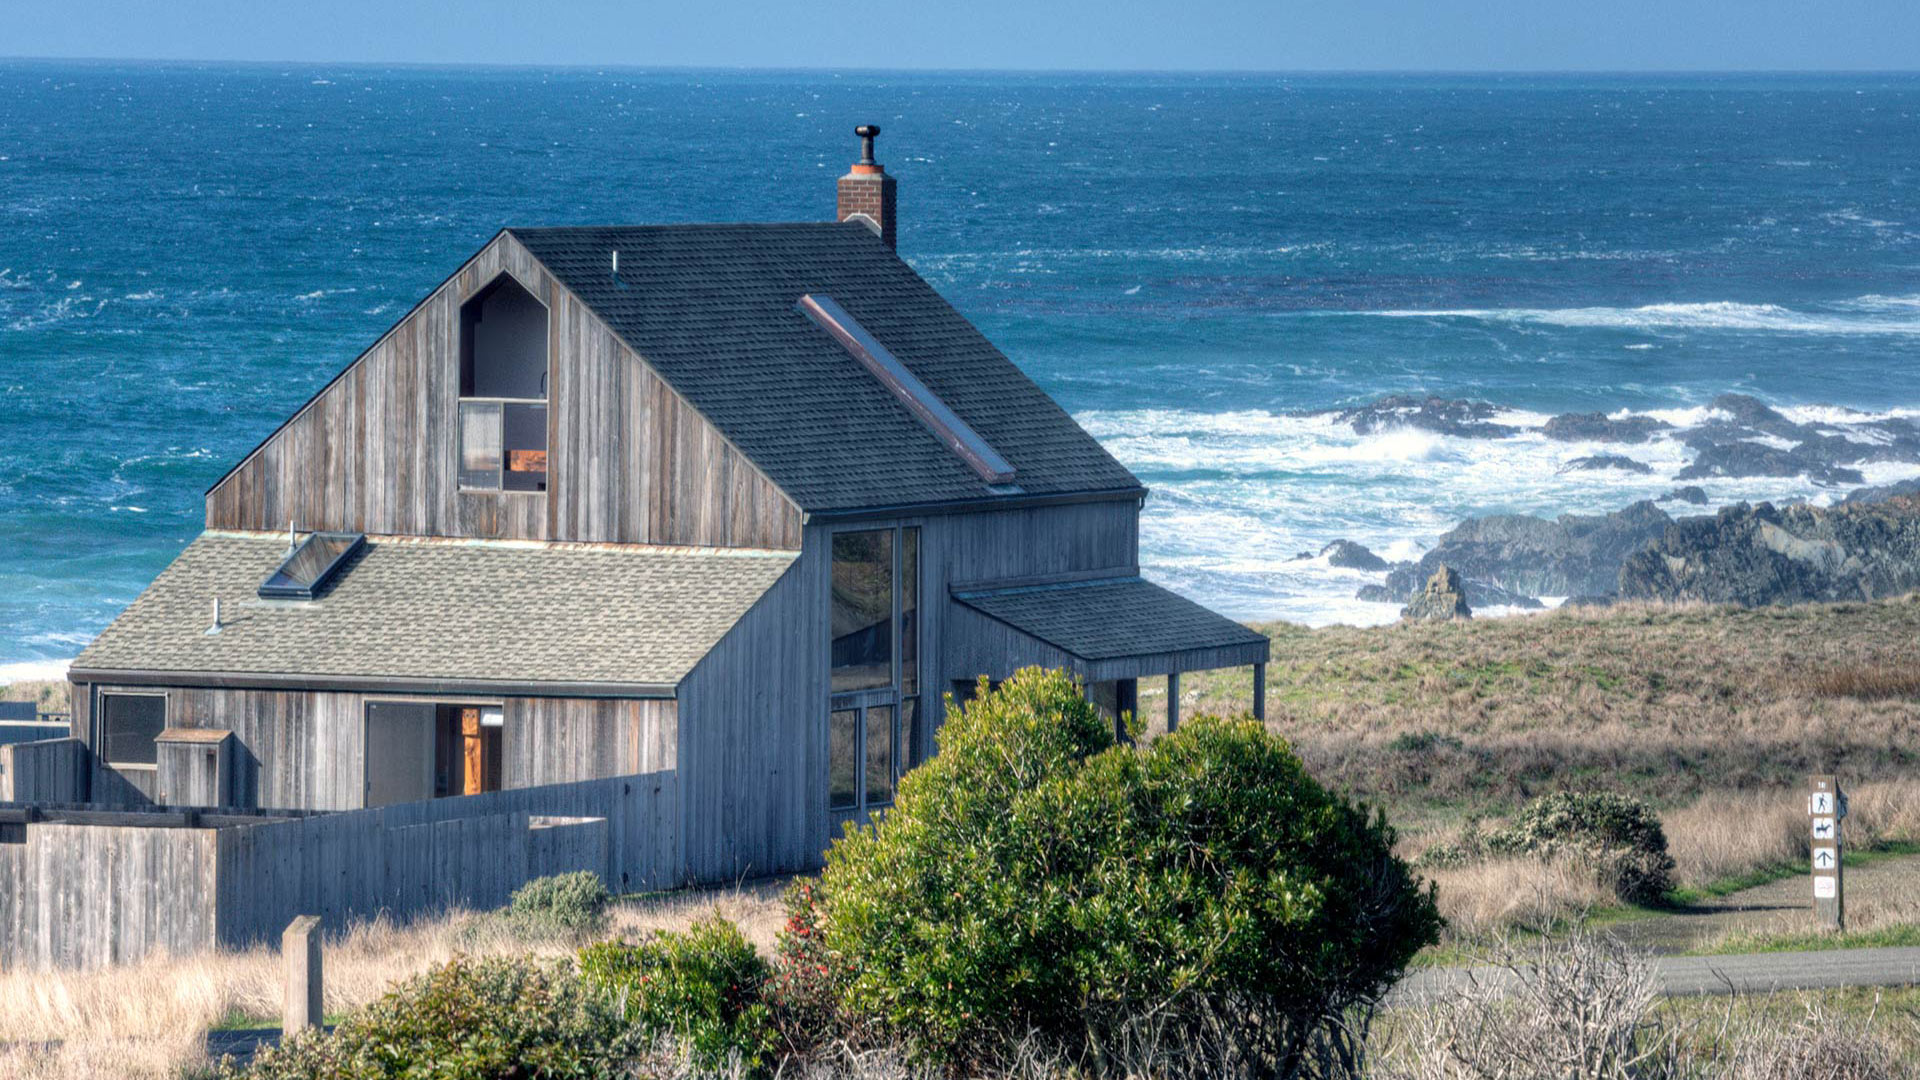 The Sea Ranch Binker Barn by Jim Alinder